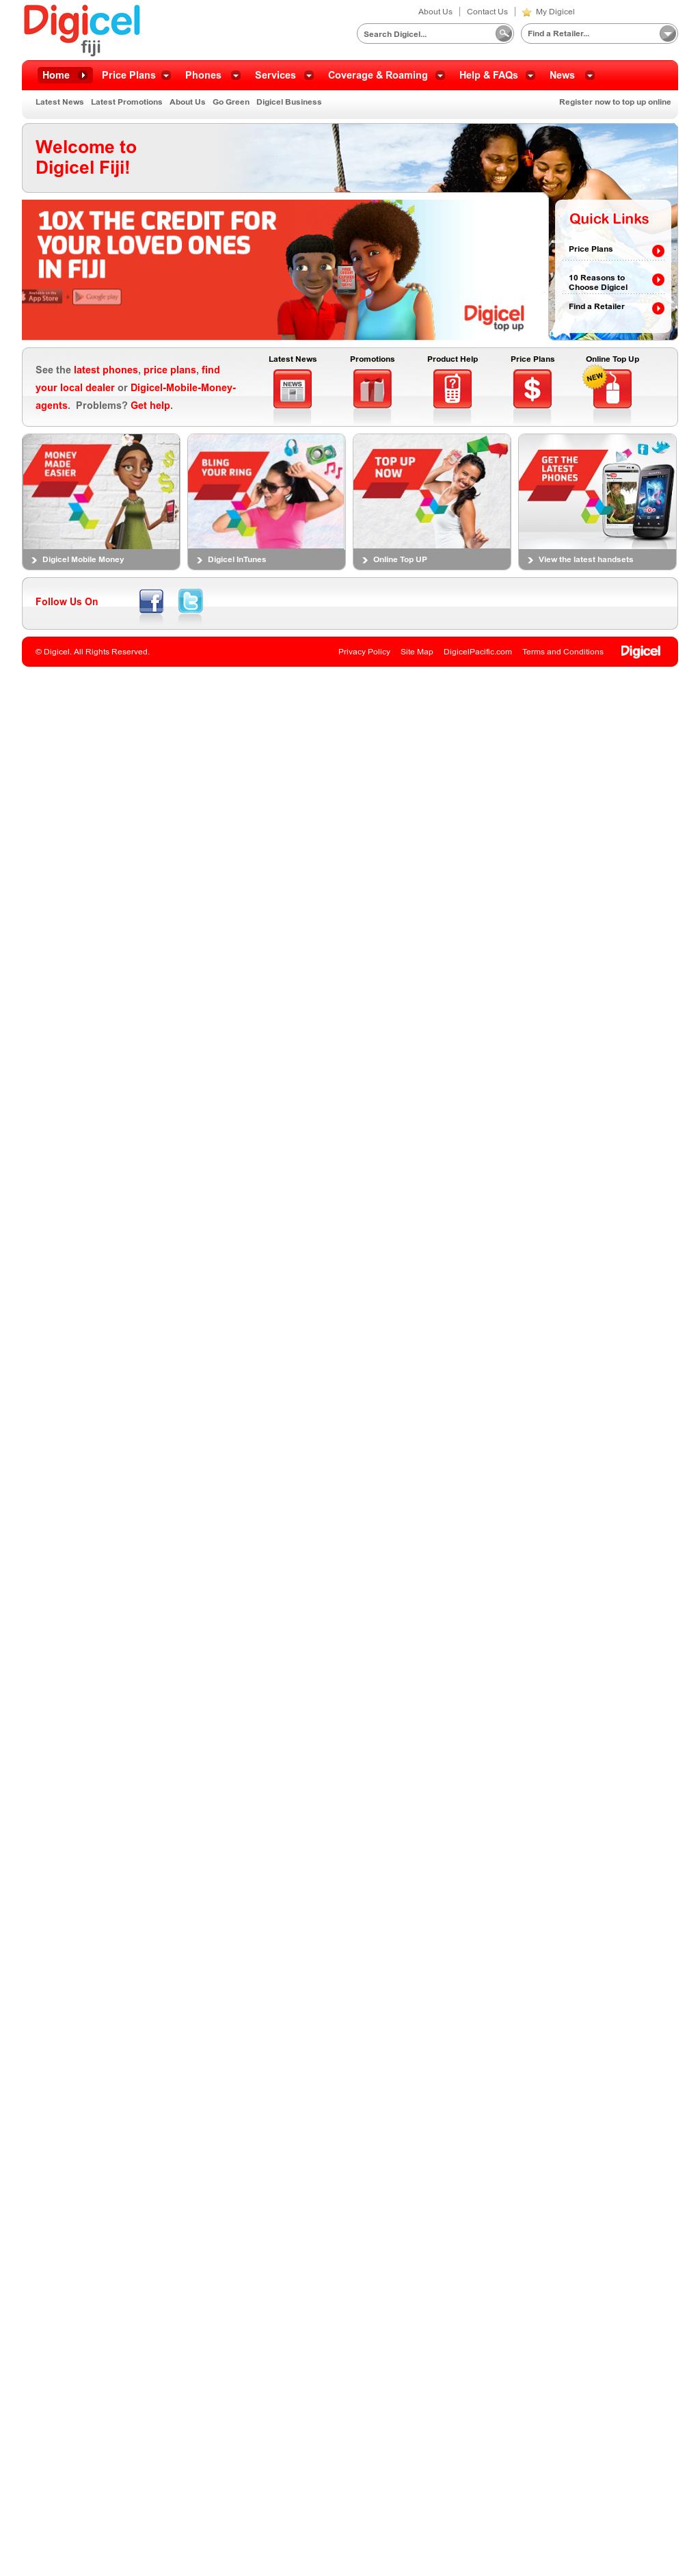 Owler Reports - Digicel Fiji: Digicel Fiji upgrades Double